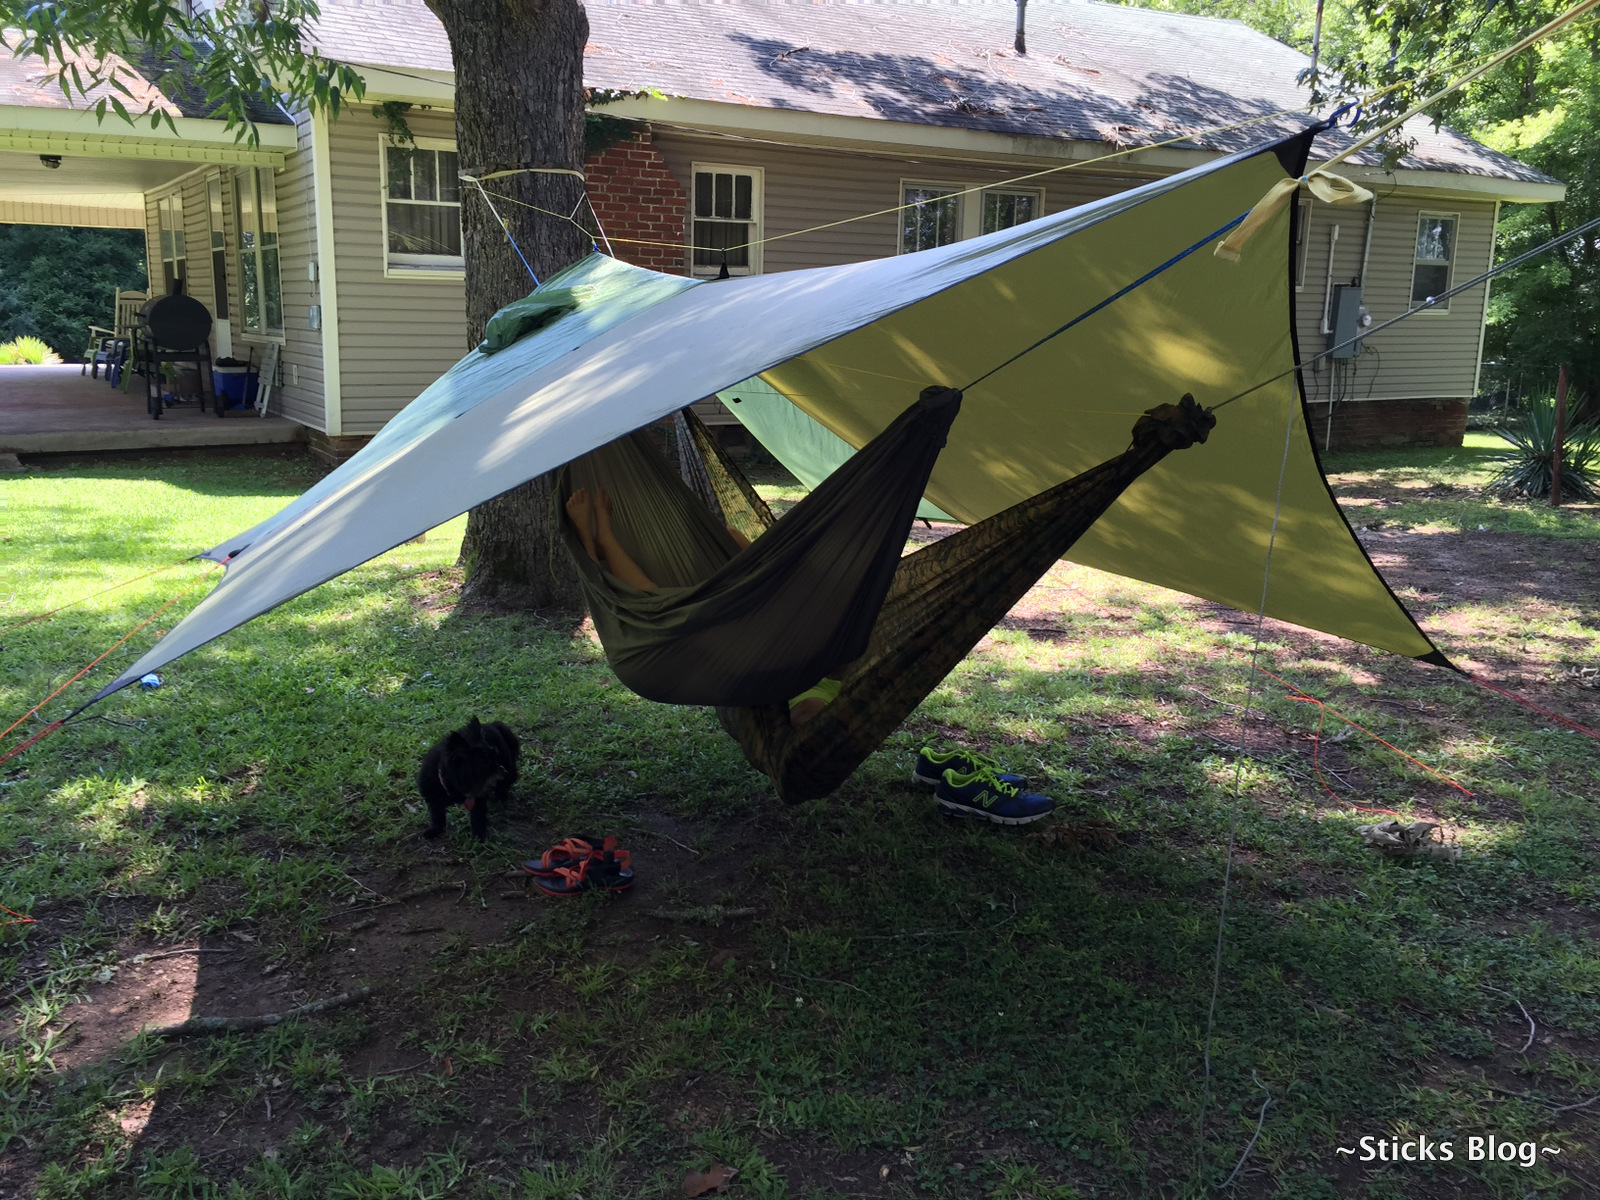 sul   hammock gear list for 3 25 day at section hike phgt  meet virginia  u201csul u201d gear list   stick u0027s blog  rh   sticksblog